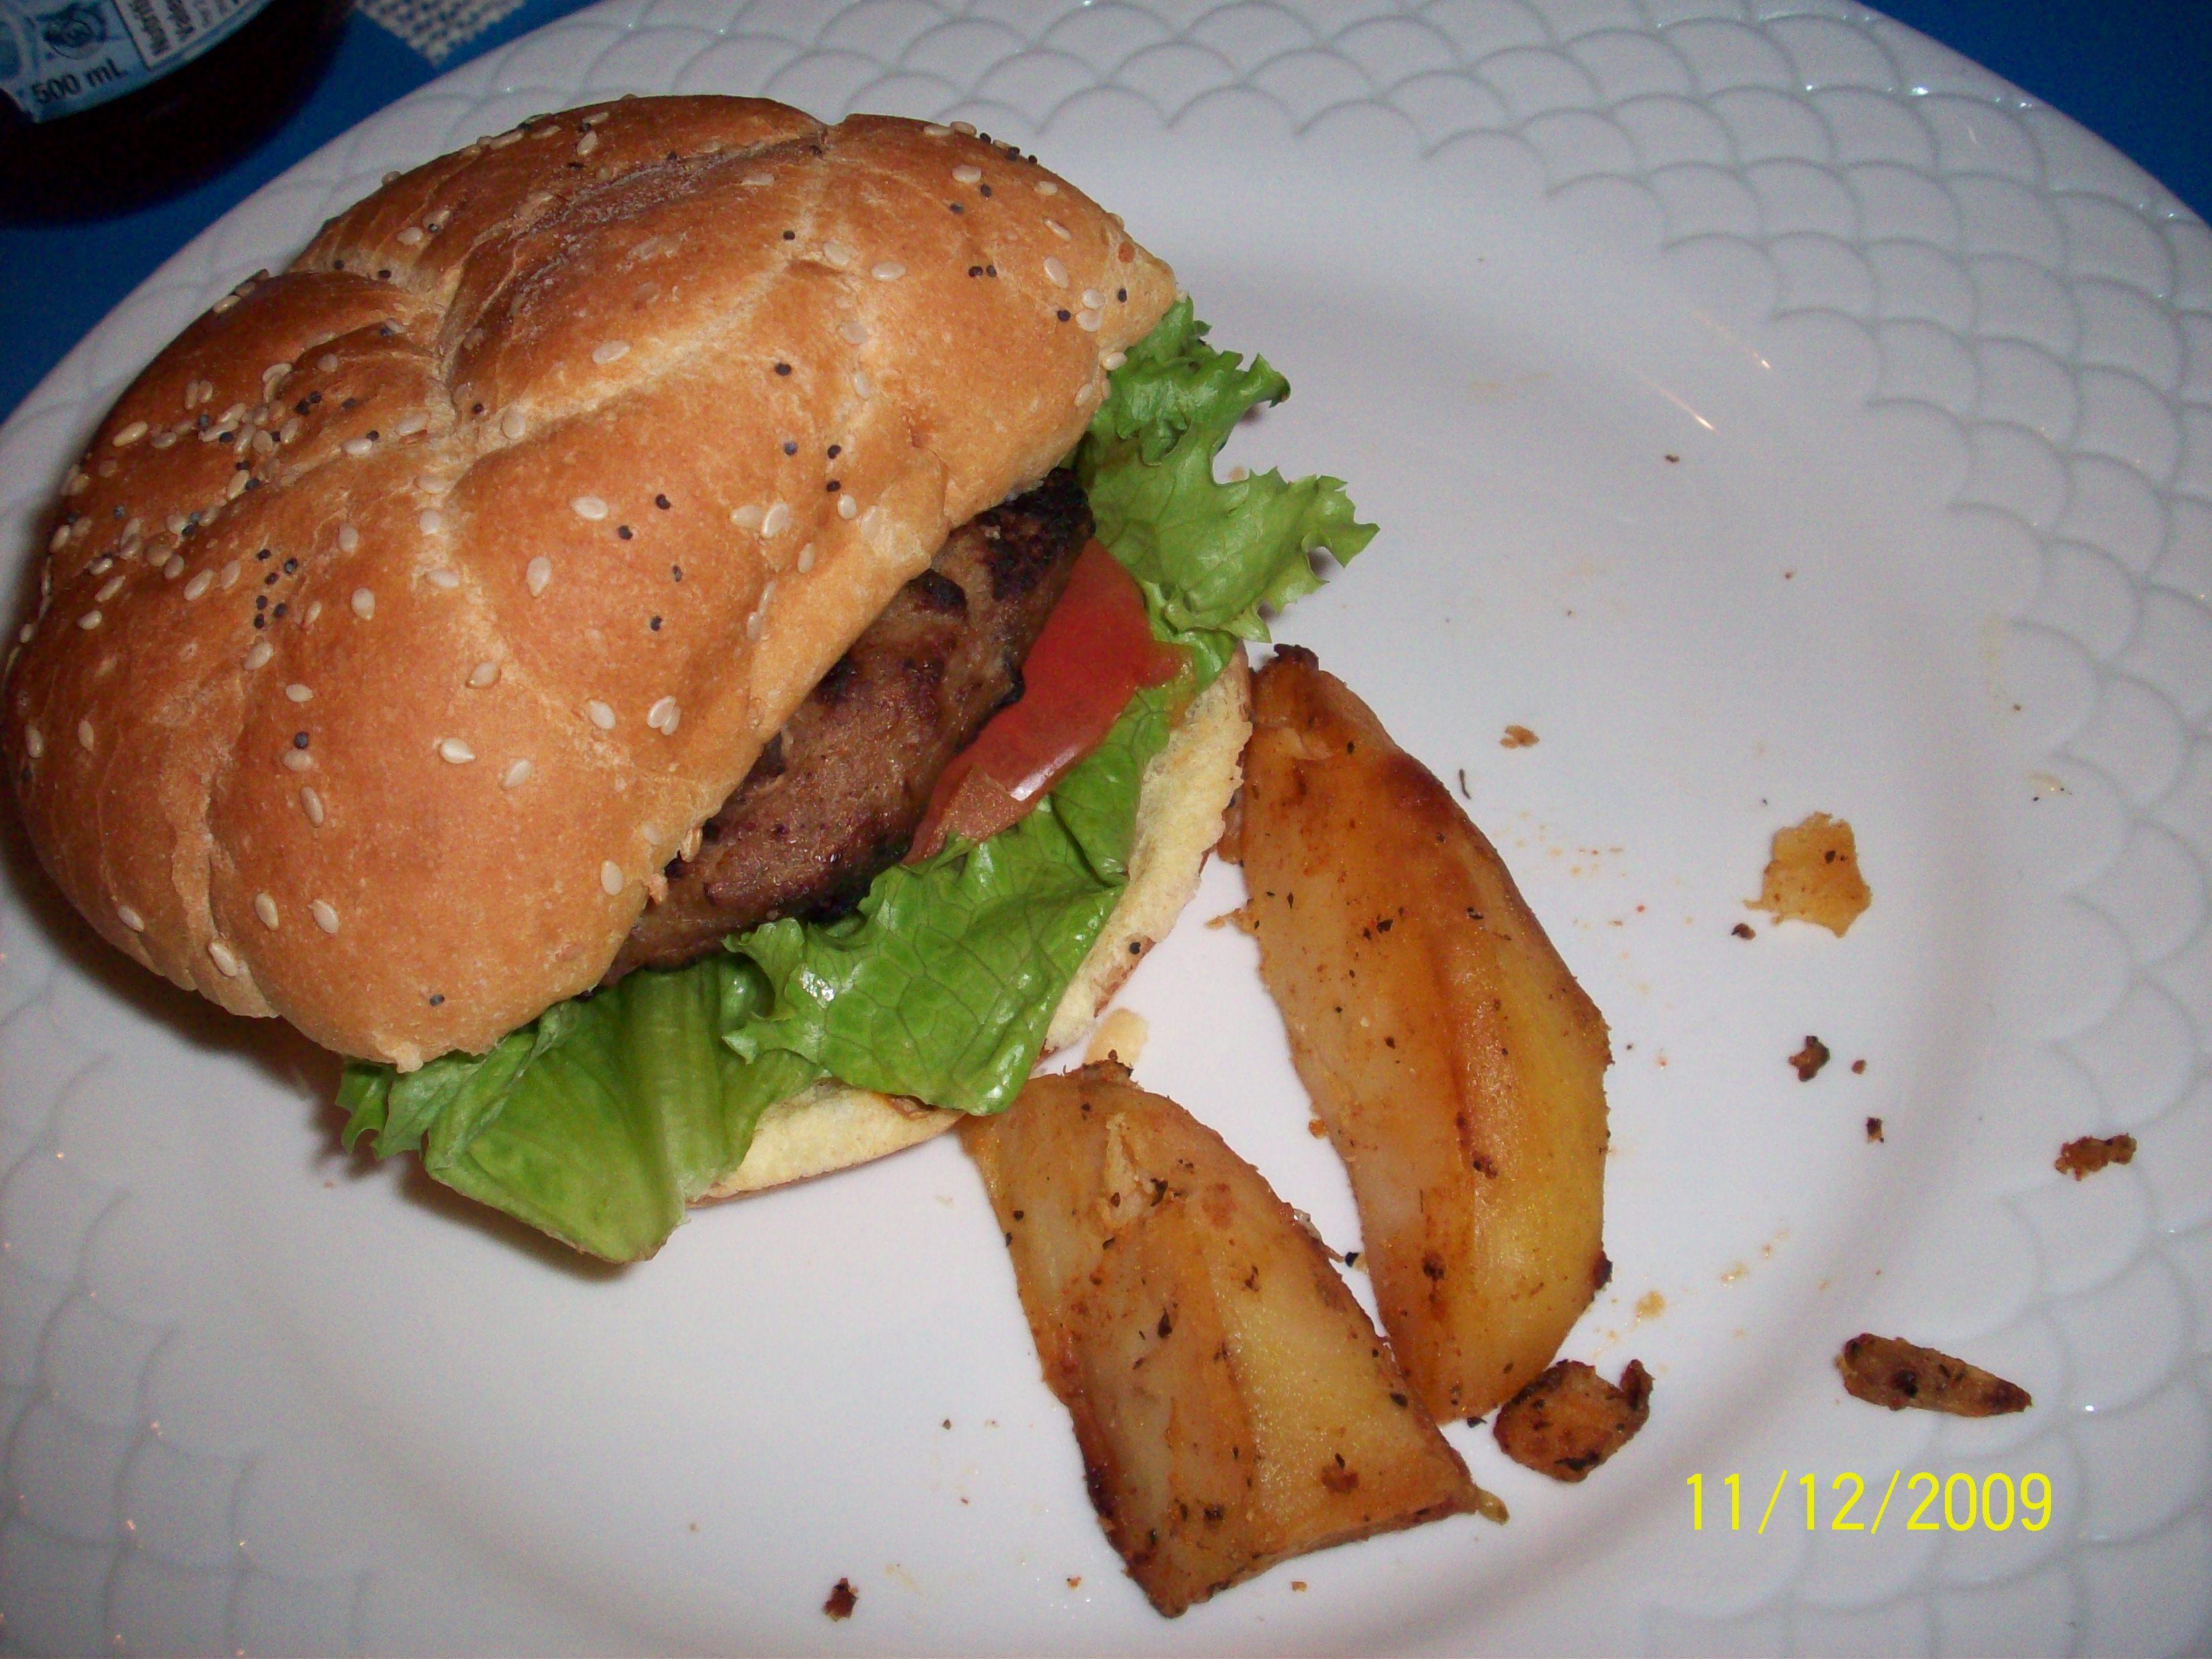 http://foodloader.net/cutie_2009-12-11_Turkey_Sandwich_with_Potato_Wedges.jpg